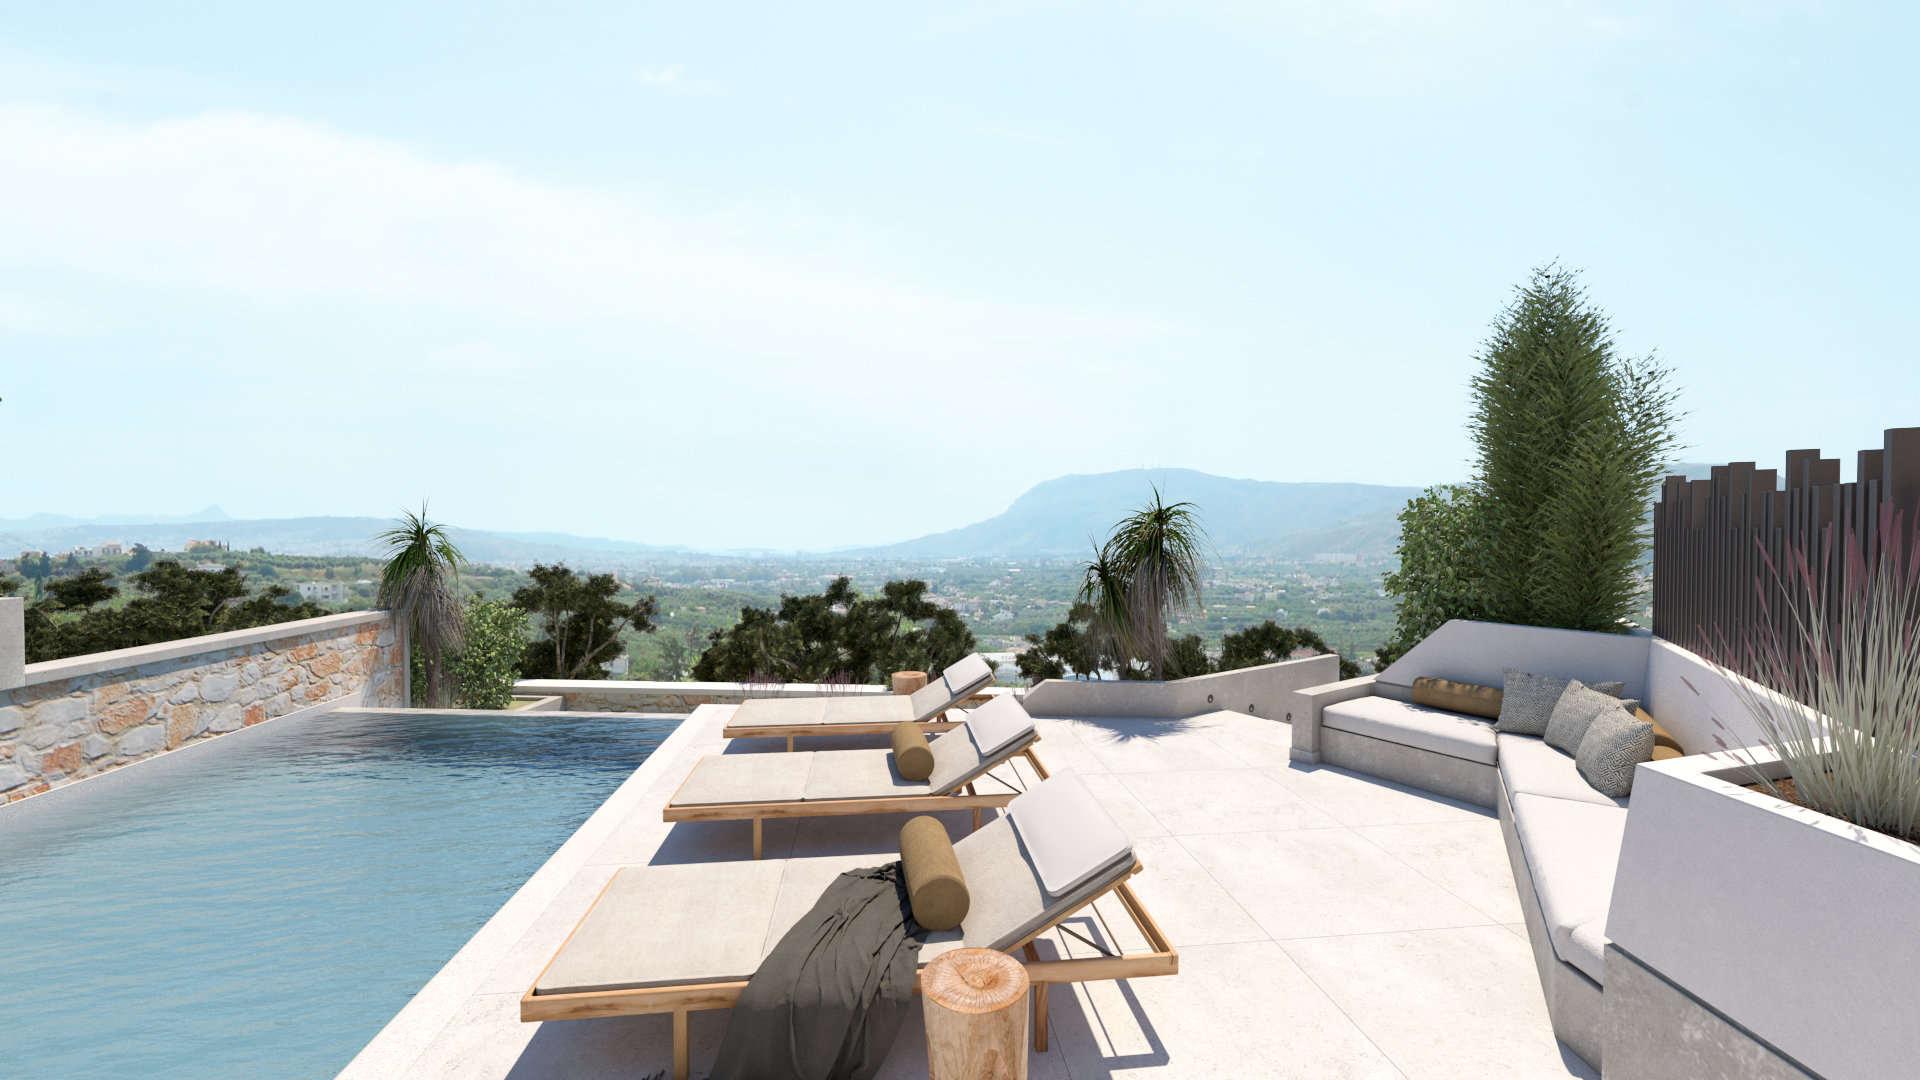 outdoor spaces renovation, exterior design, pool, διαμόρφωση εξωτερικών χώρων με πισίνες